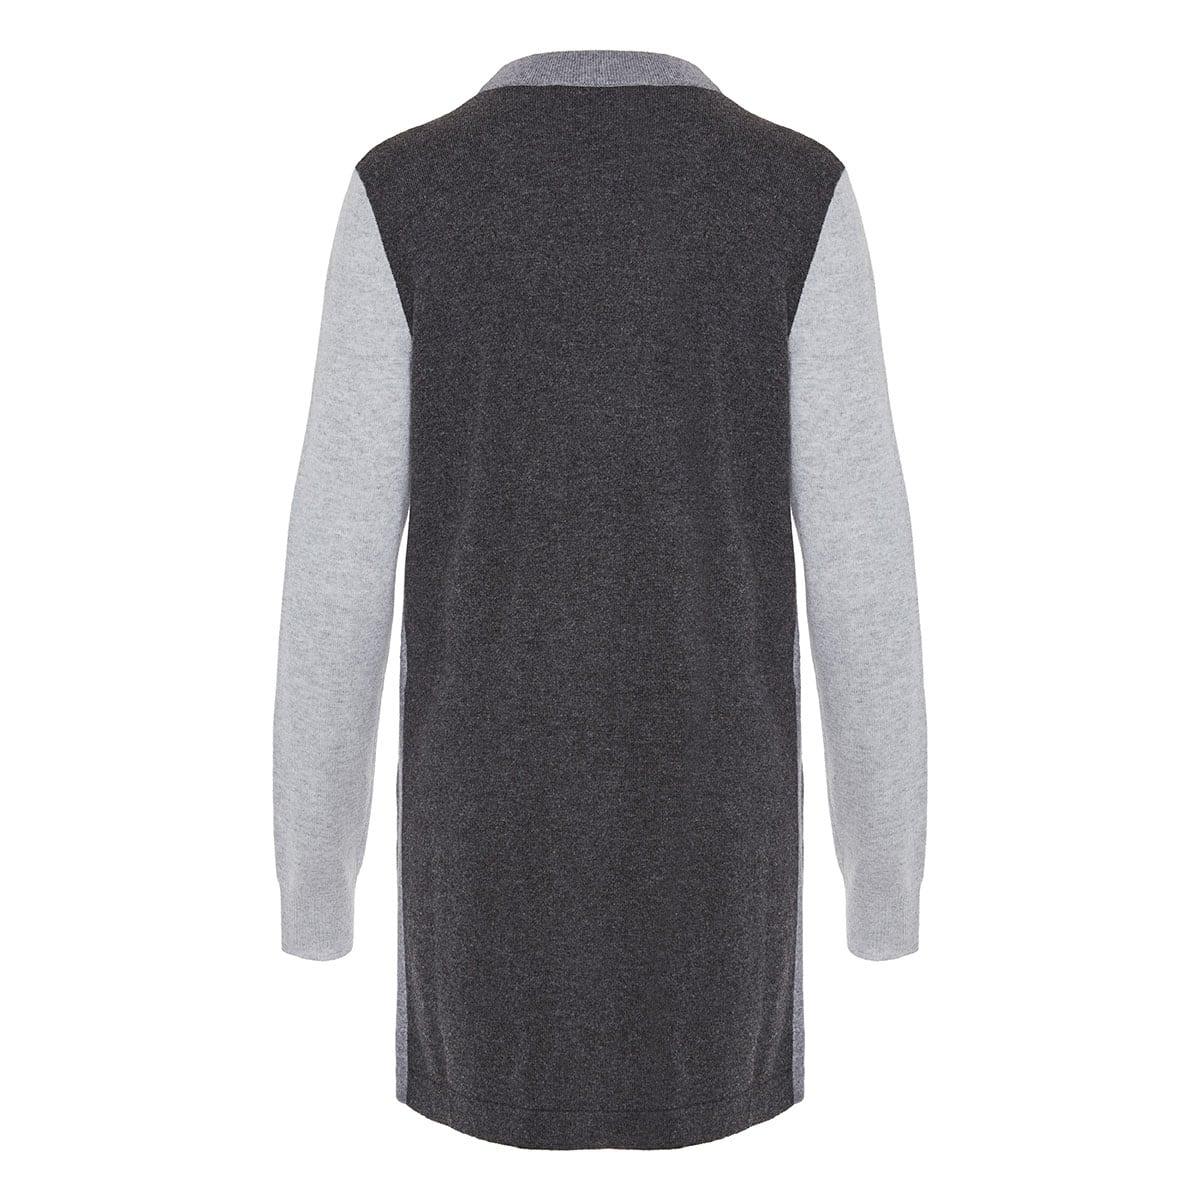 Three-tone cashmere zipped cardigan